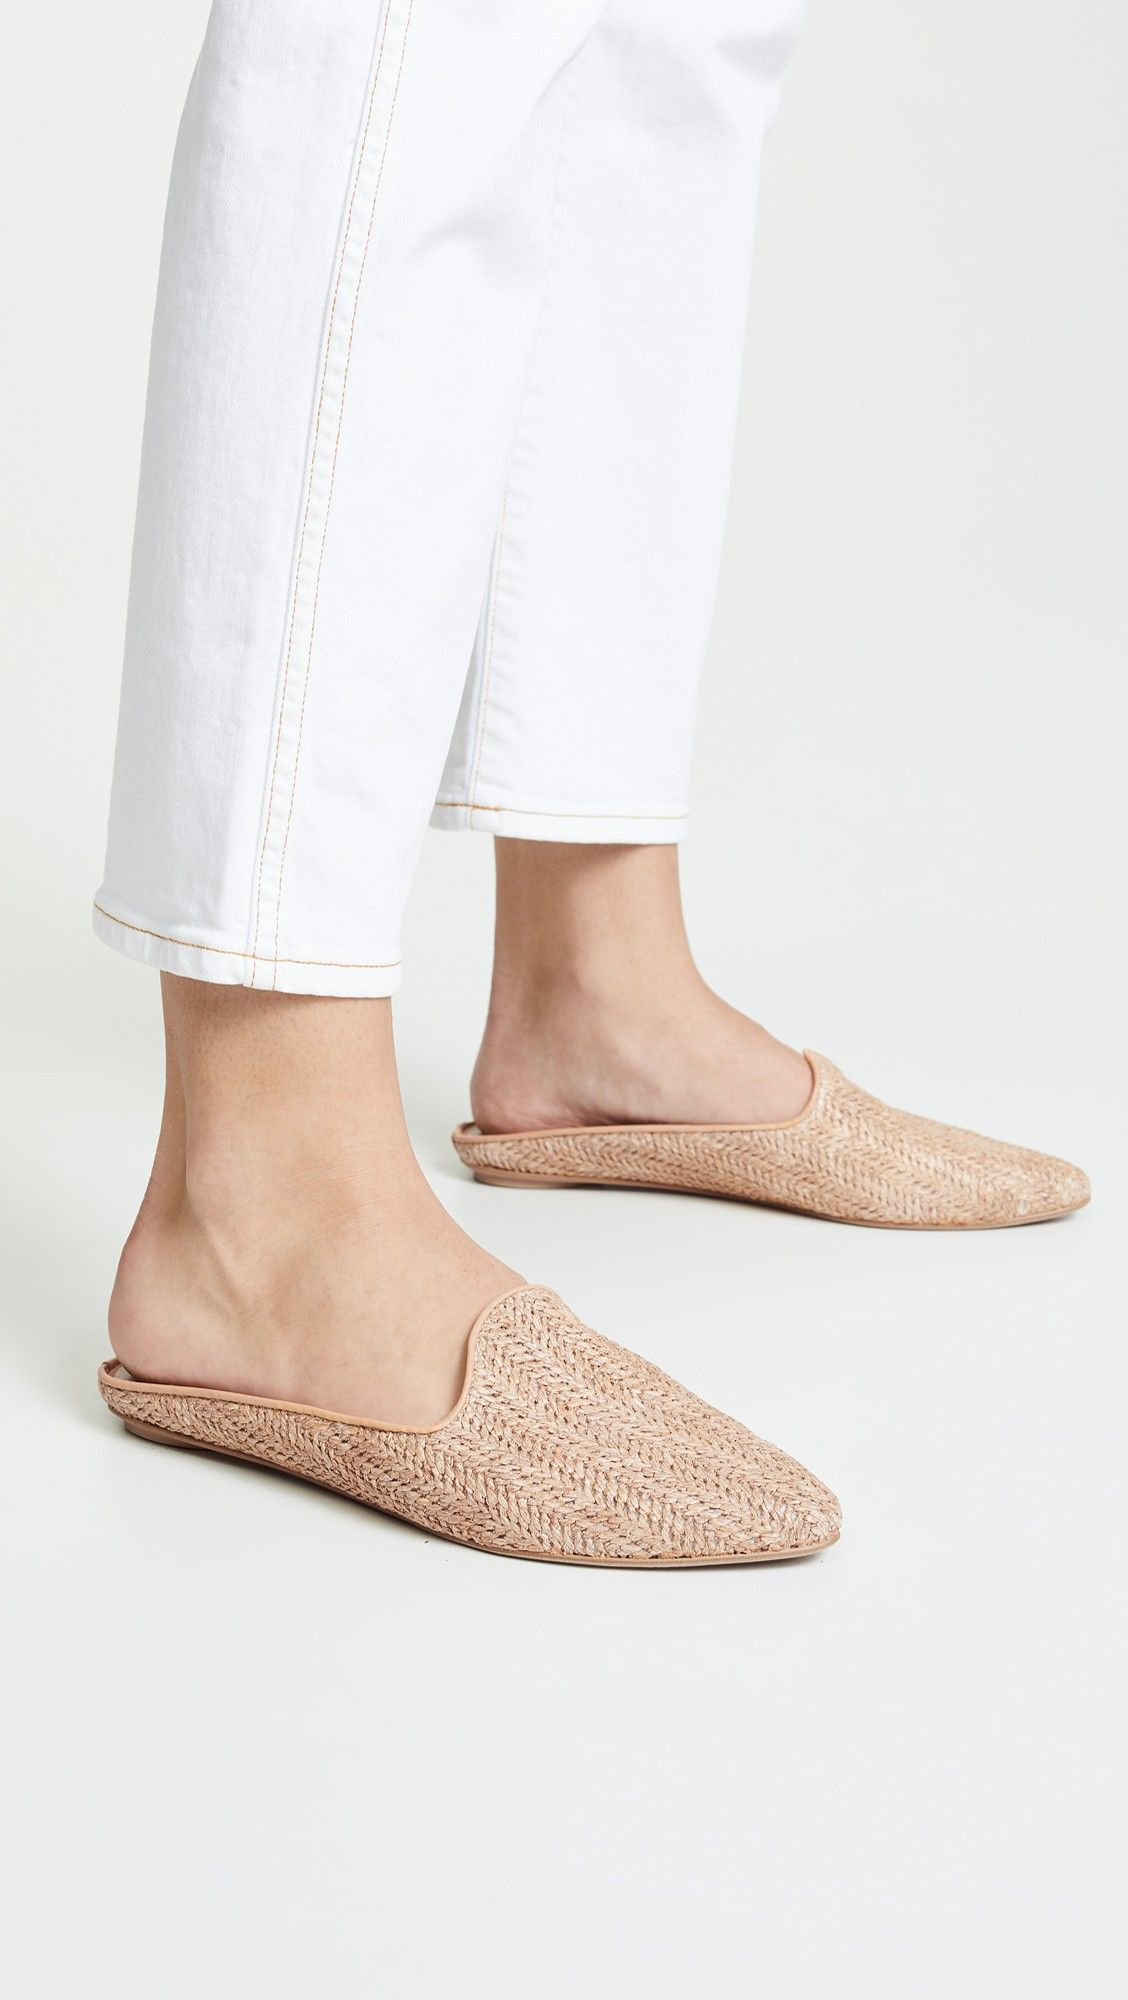 8e8abef913ea2 Grant Mules in 2019 | =Fashion= | Dolce vita, Top 10 shoes, Fashion ...